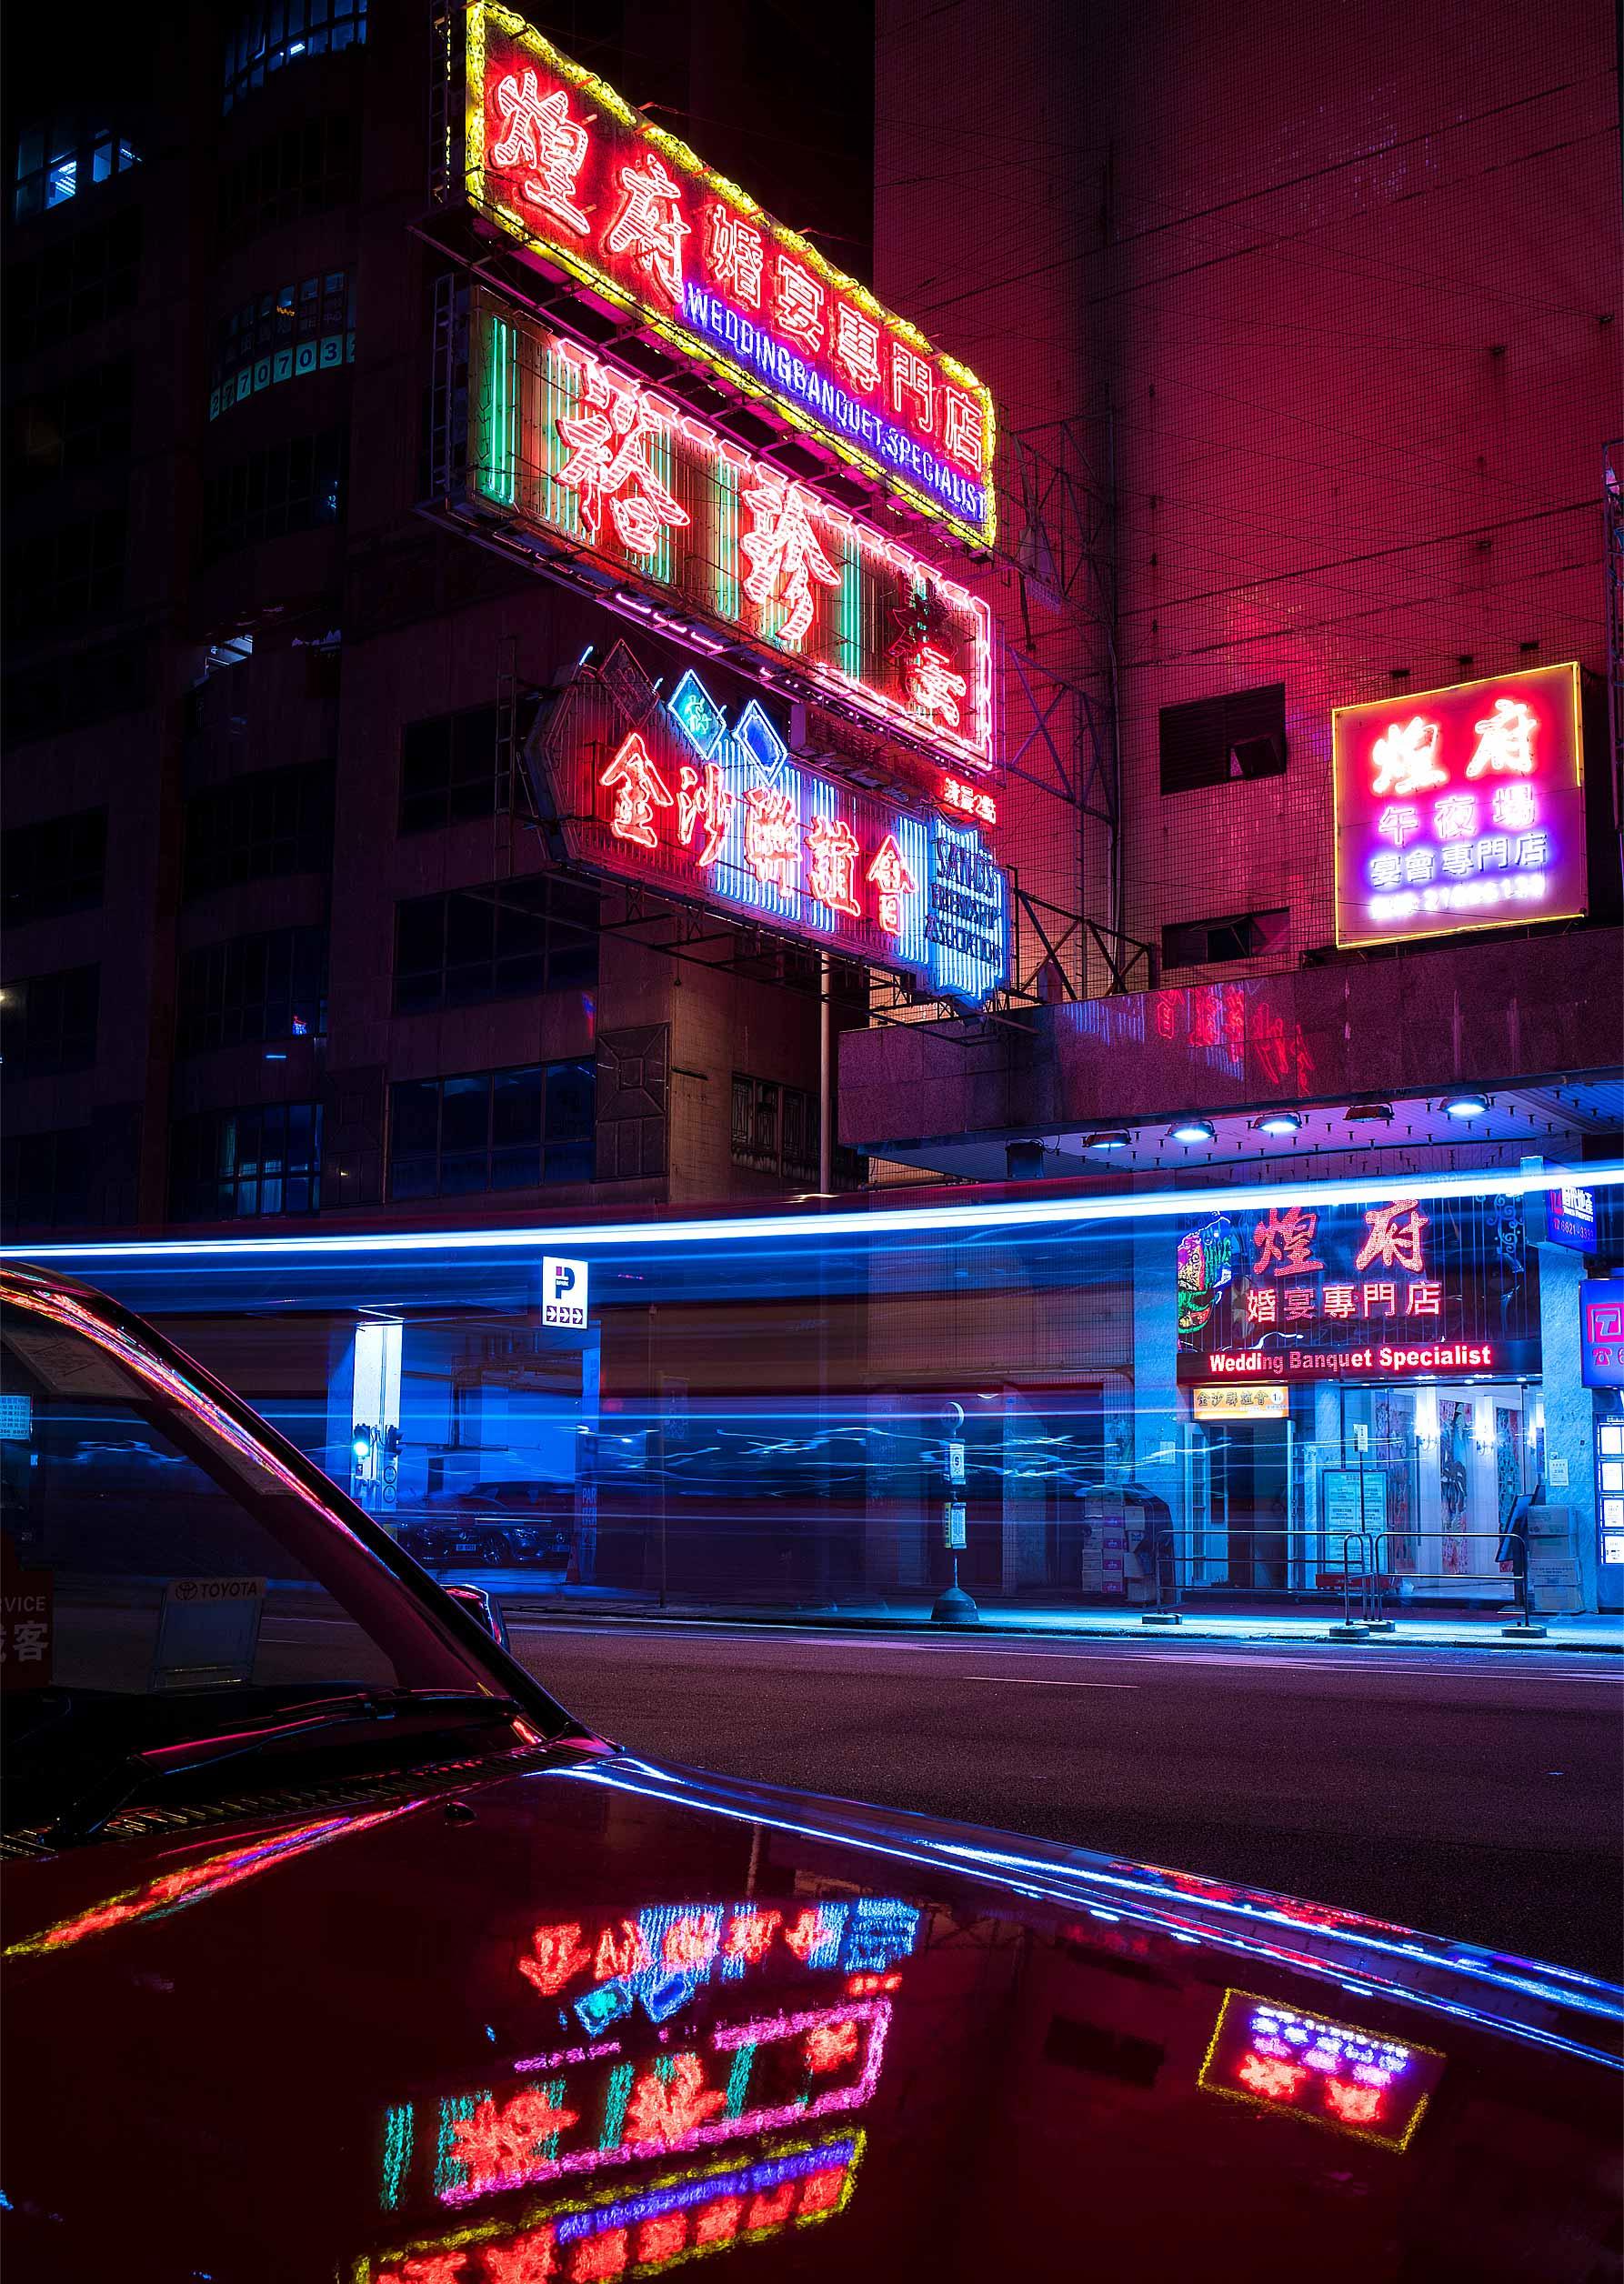 Long exposure night time shot of Hong Kong street